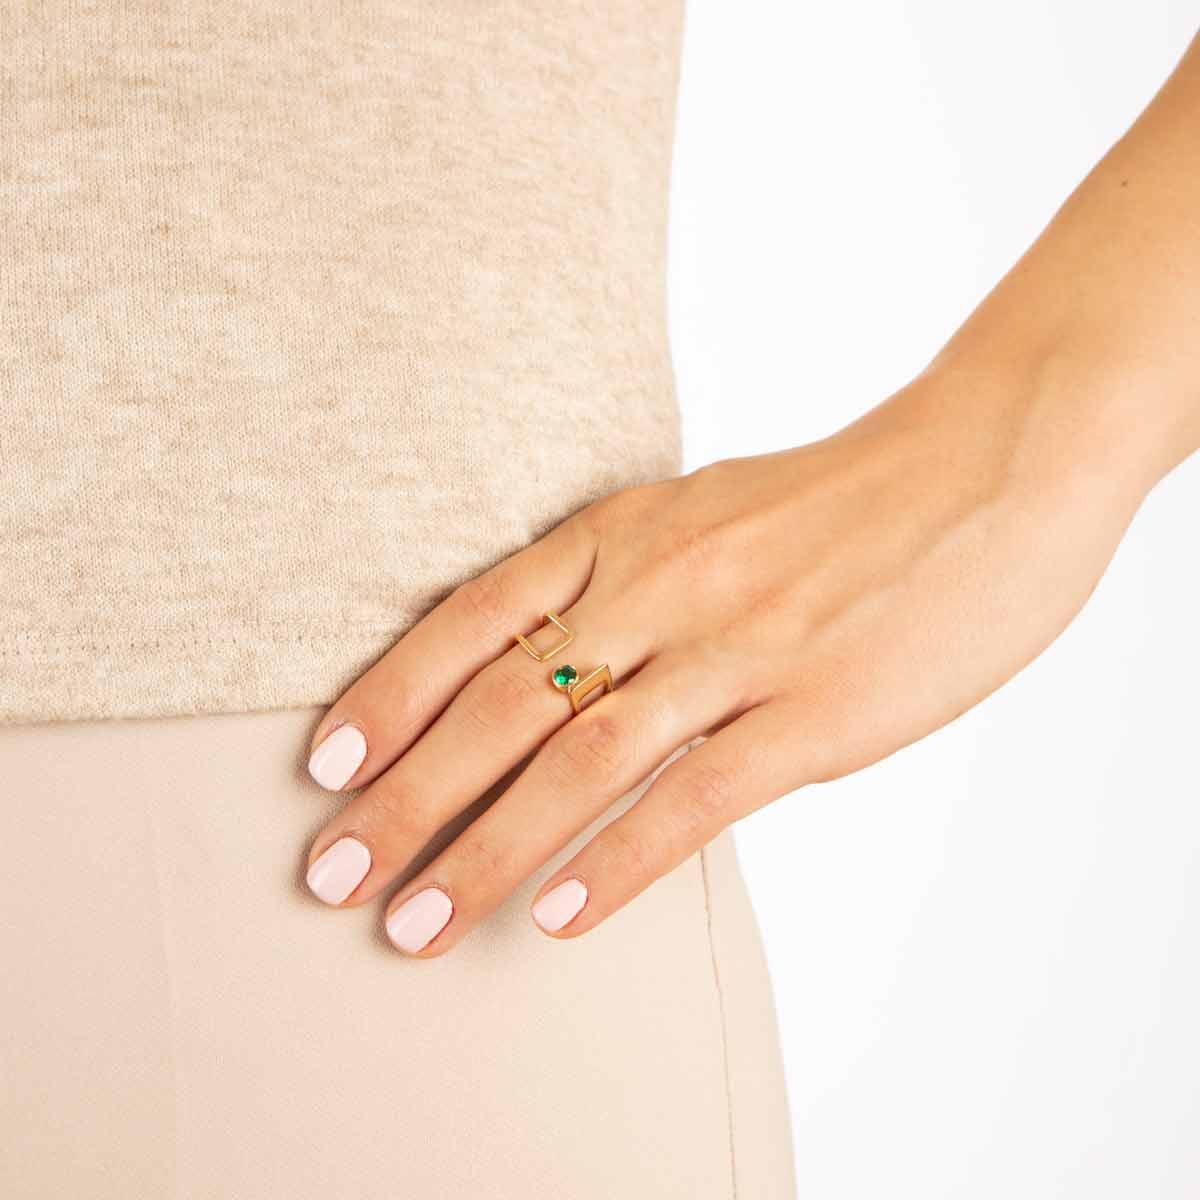 انگشتر طلا دایره سبز